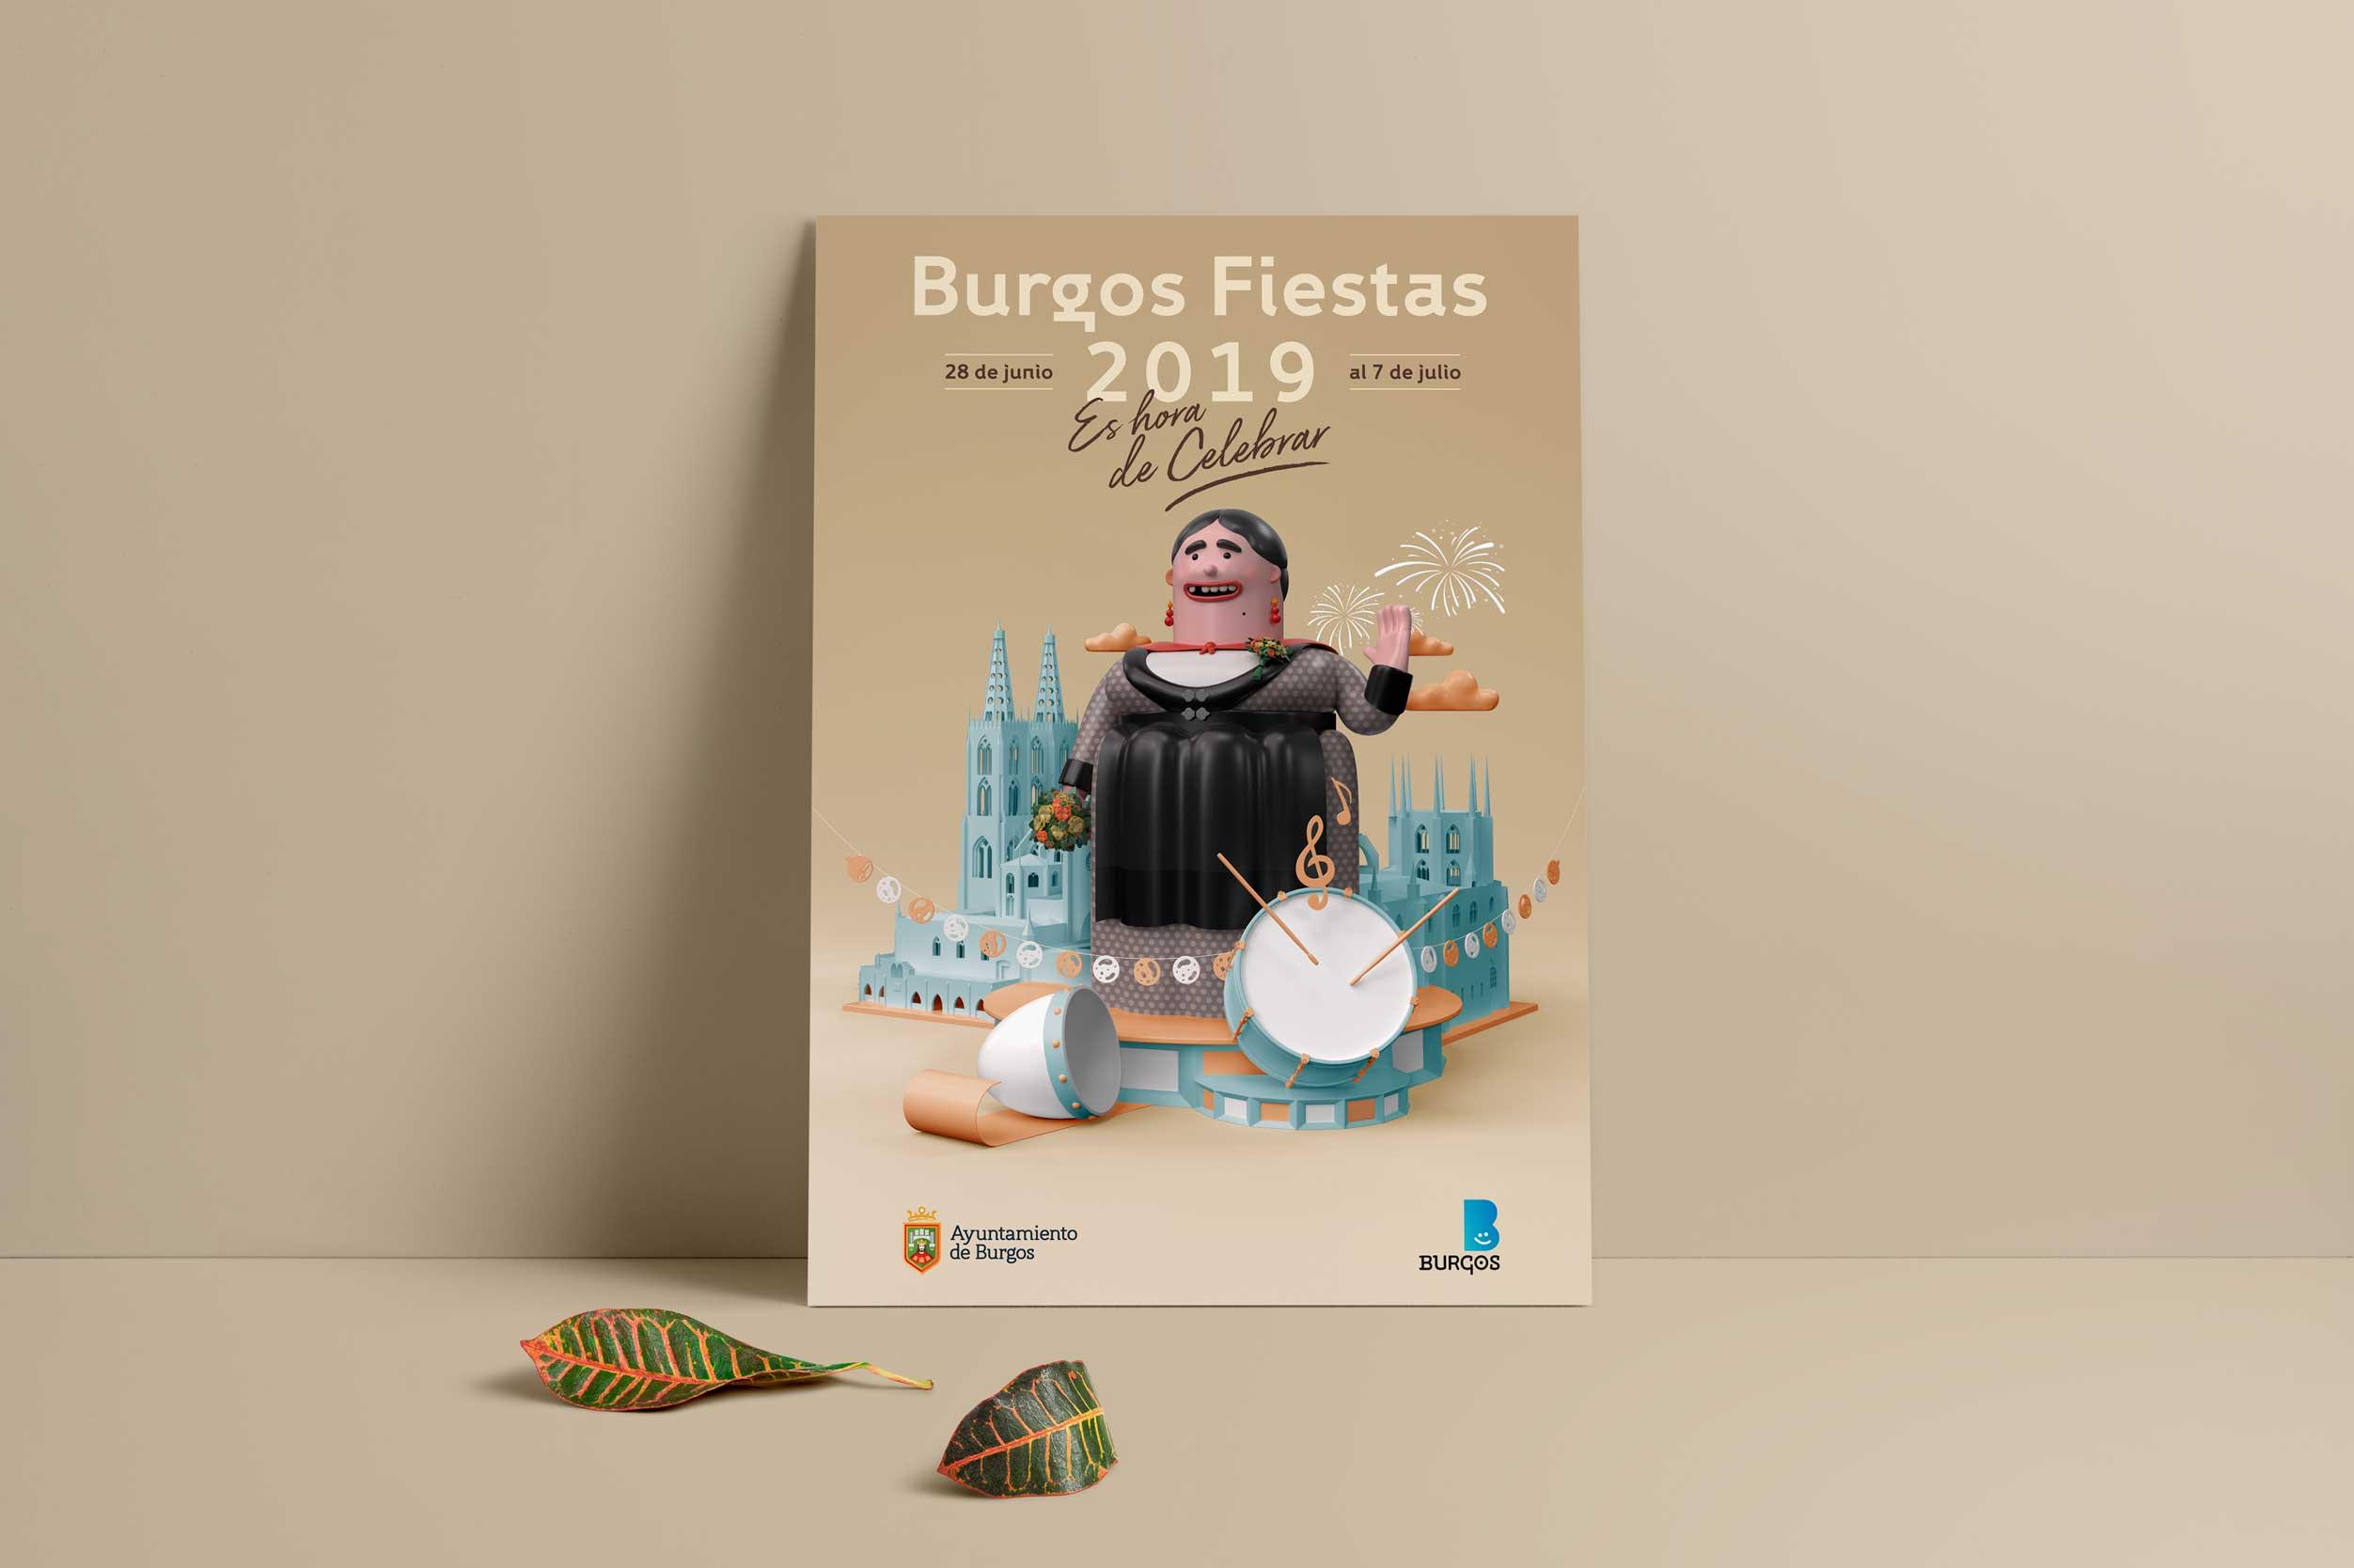 Fiestas-Burgos-2019-poster